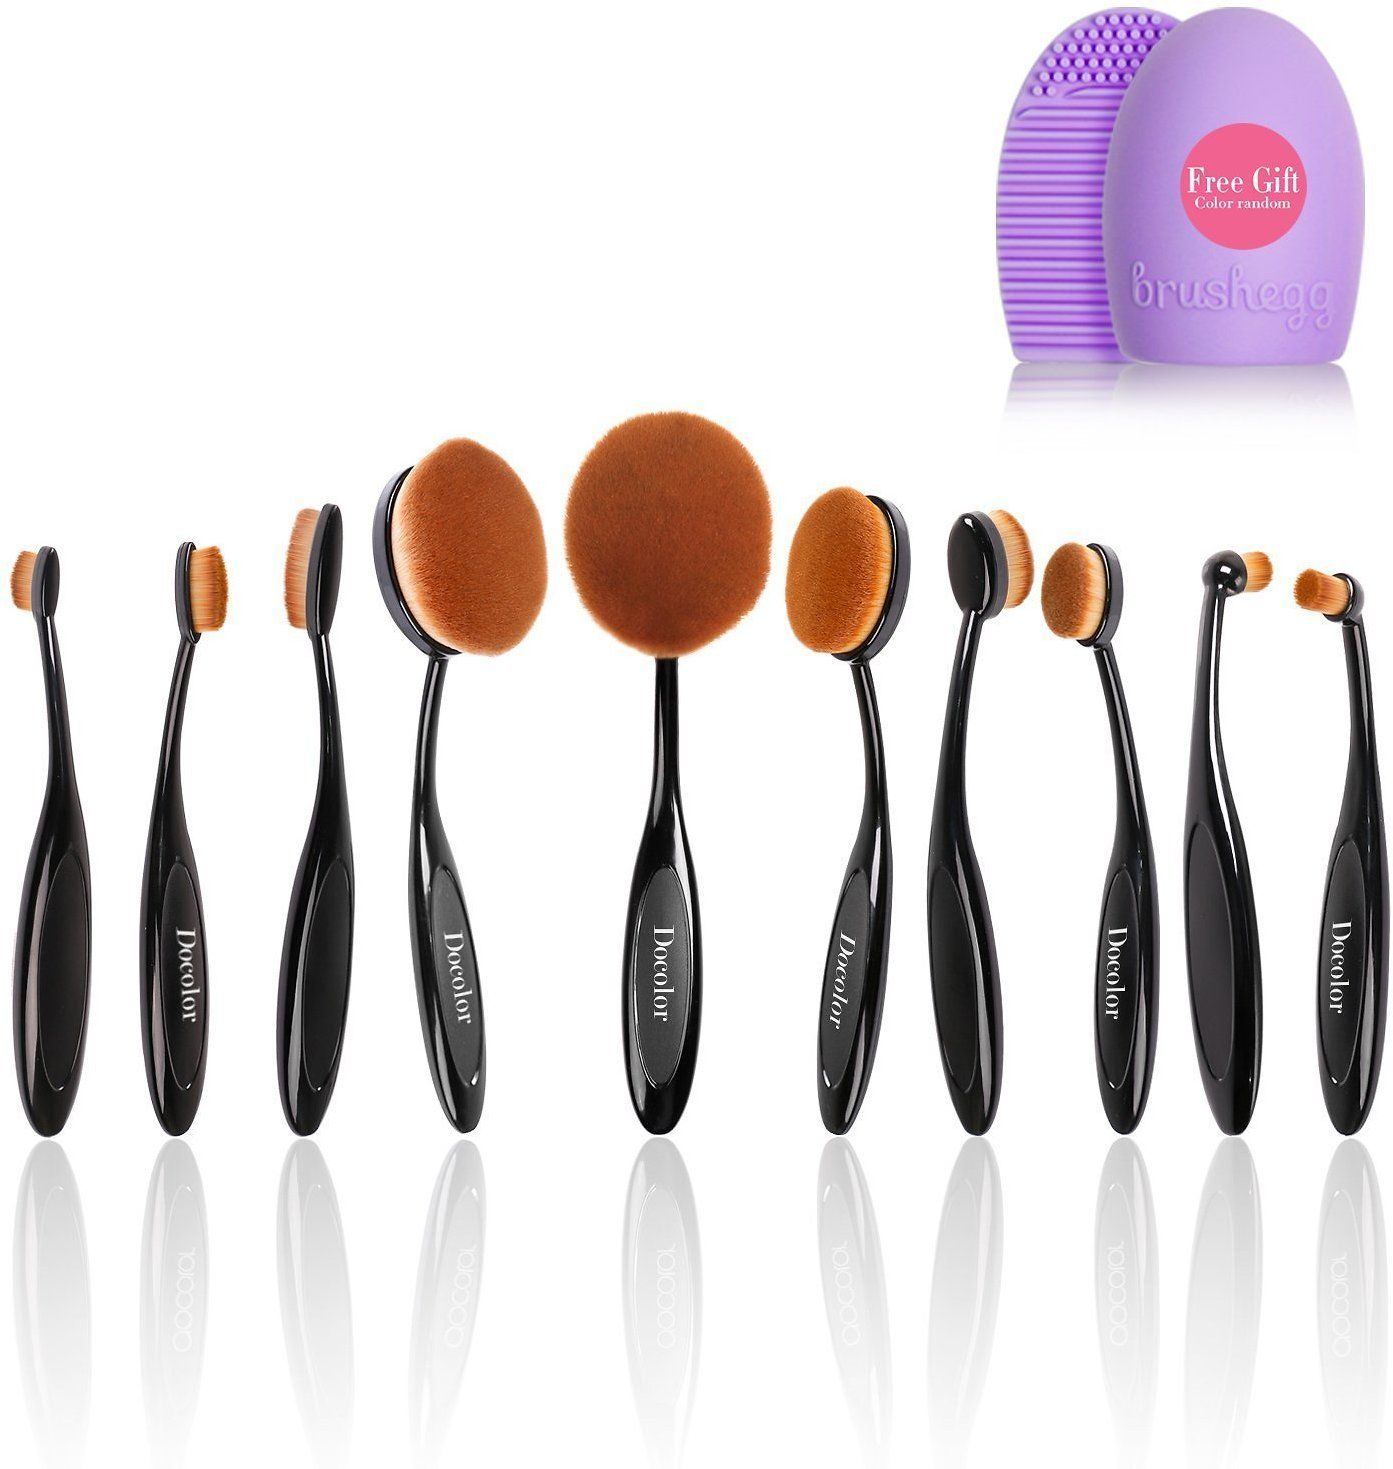 10Pcs Oval Makeup Brushes Set Toothbrush Foundation Kits